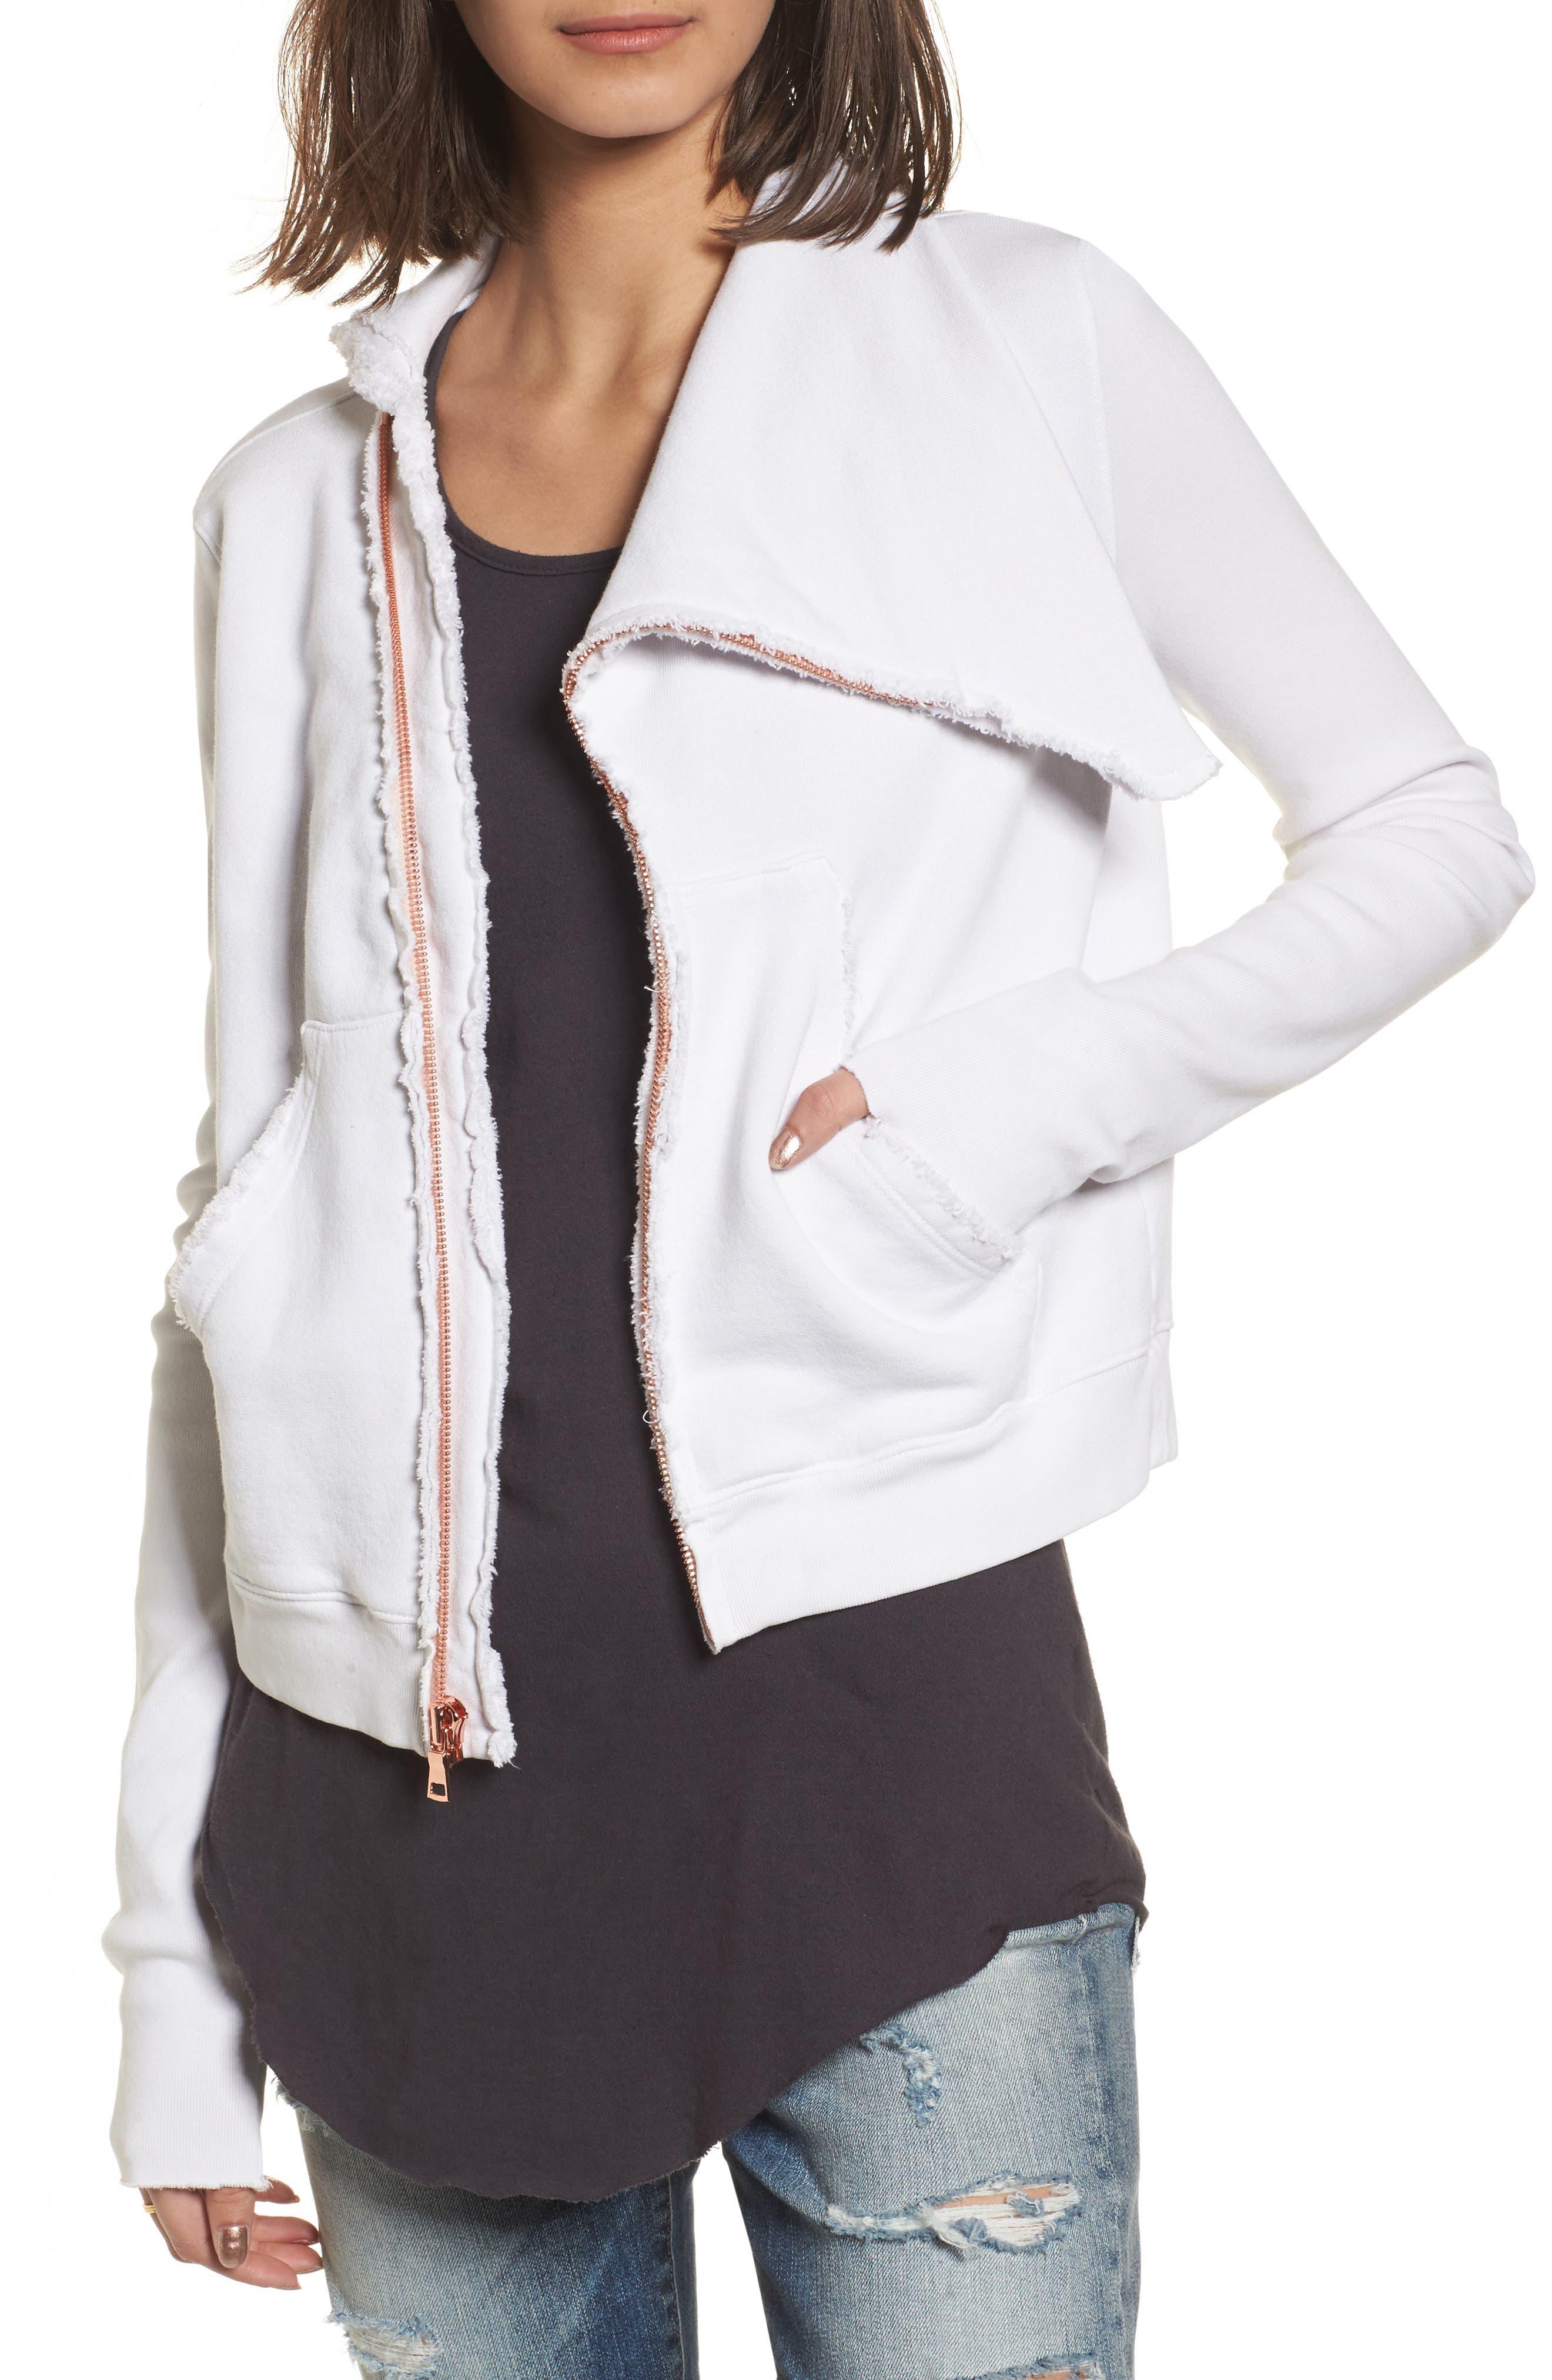 Frank & Eileen Tee Lab Zip Fleece Jacket, White